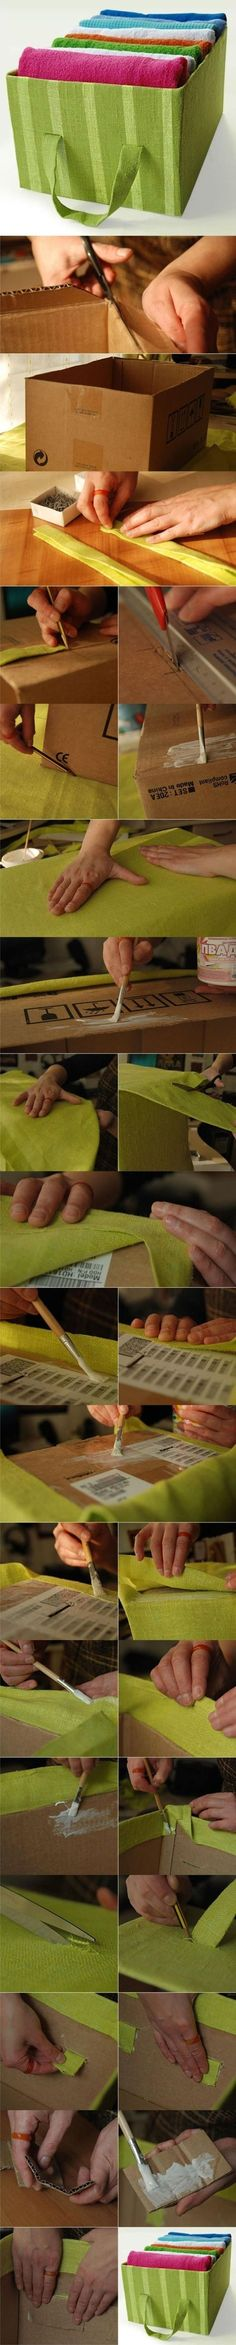 DIY Storage Drawer from Corrugated Box | iCreativeIdeas.com Follow Us on Facebook --> https://www.facebook.com/icreativeideas